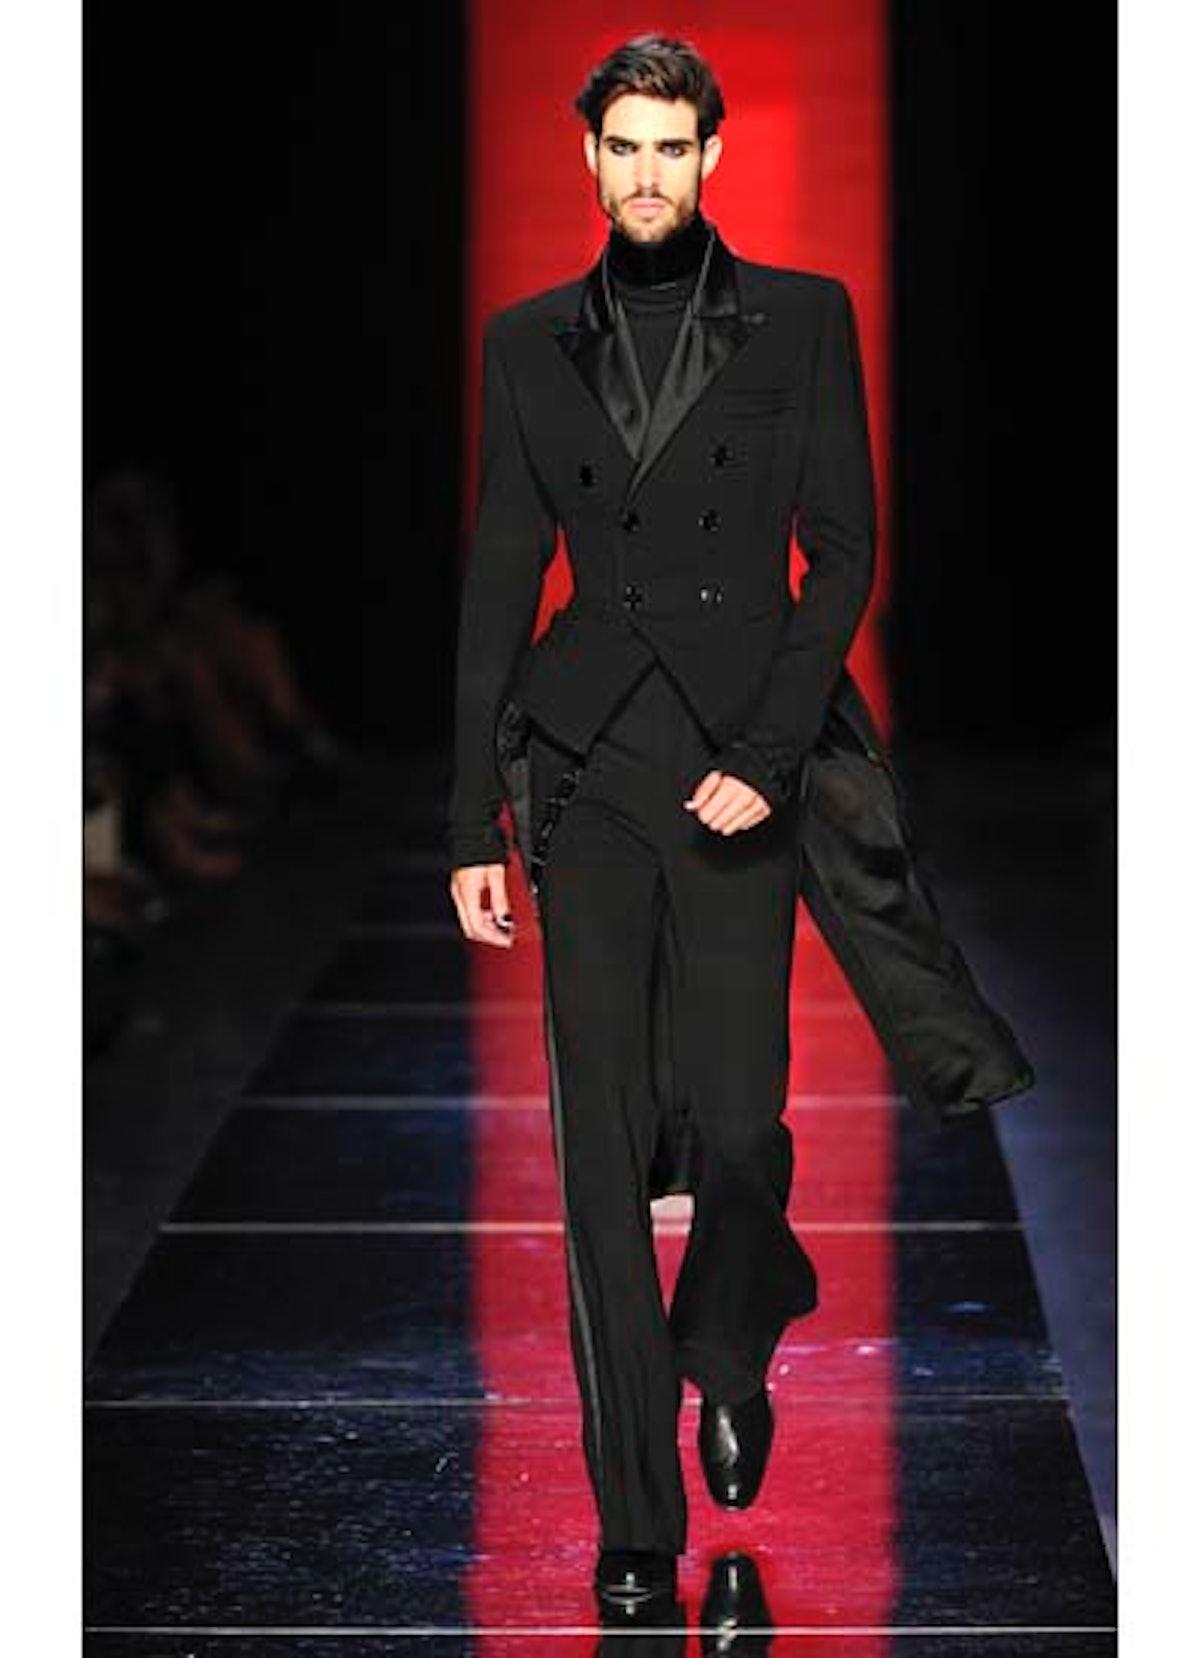 fass-jean-paul-gaultier-couture-2012-runway-36-v.jpg